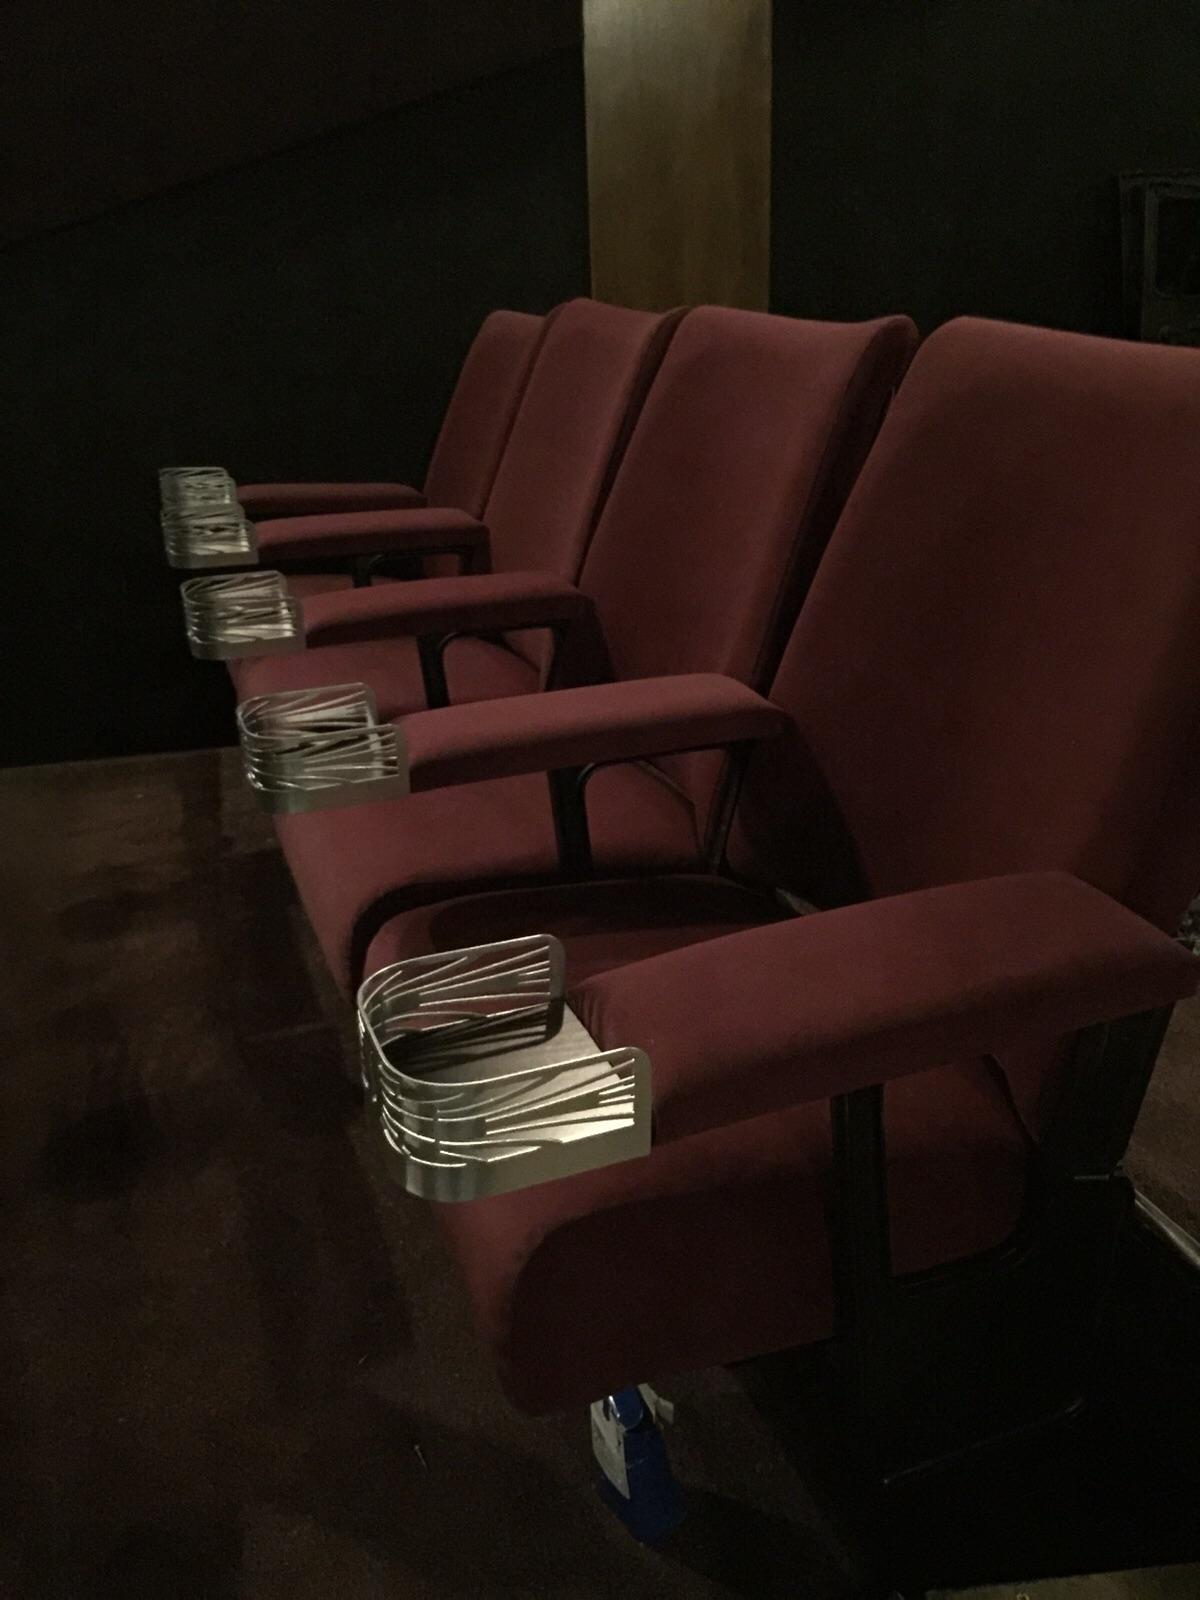 Photo 15 10 2015 12 32 57 cinema seating